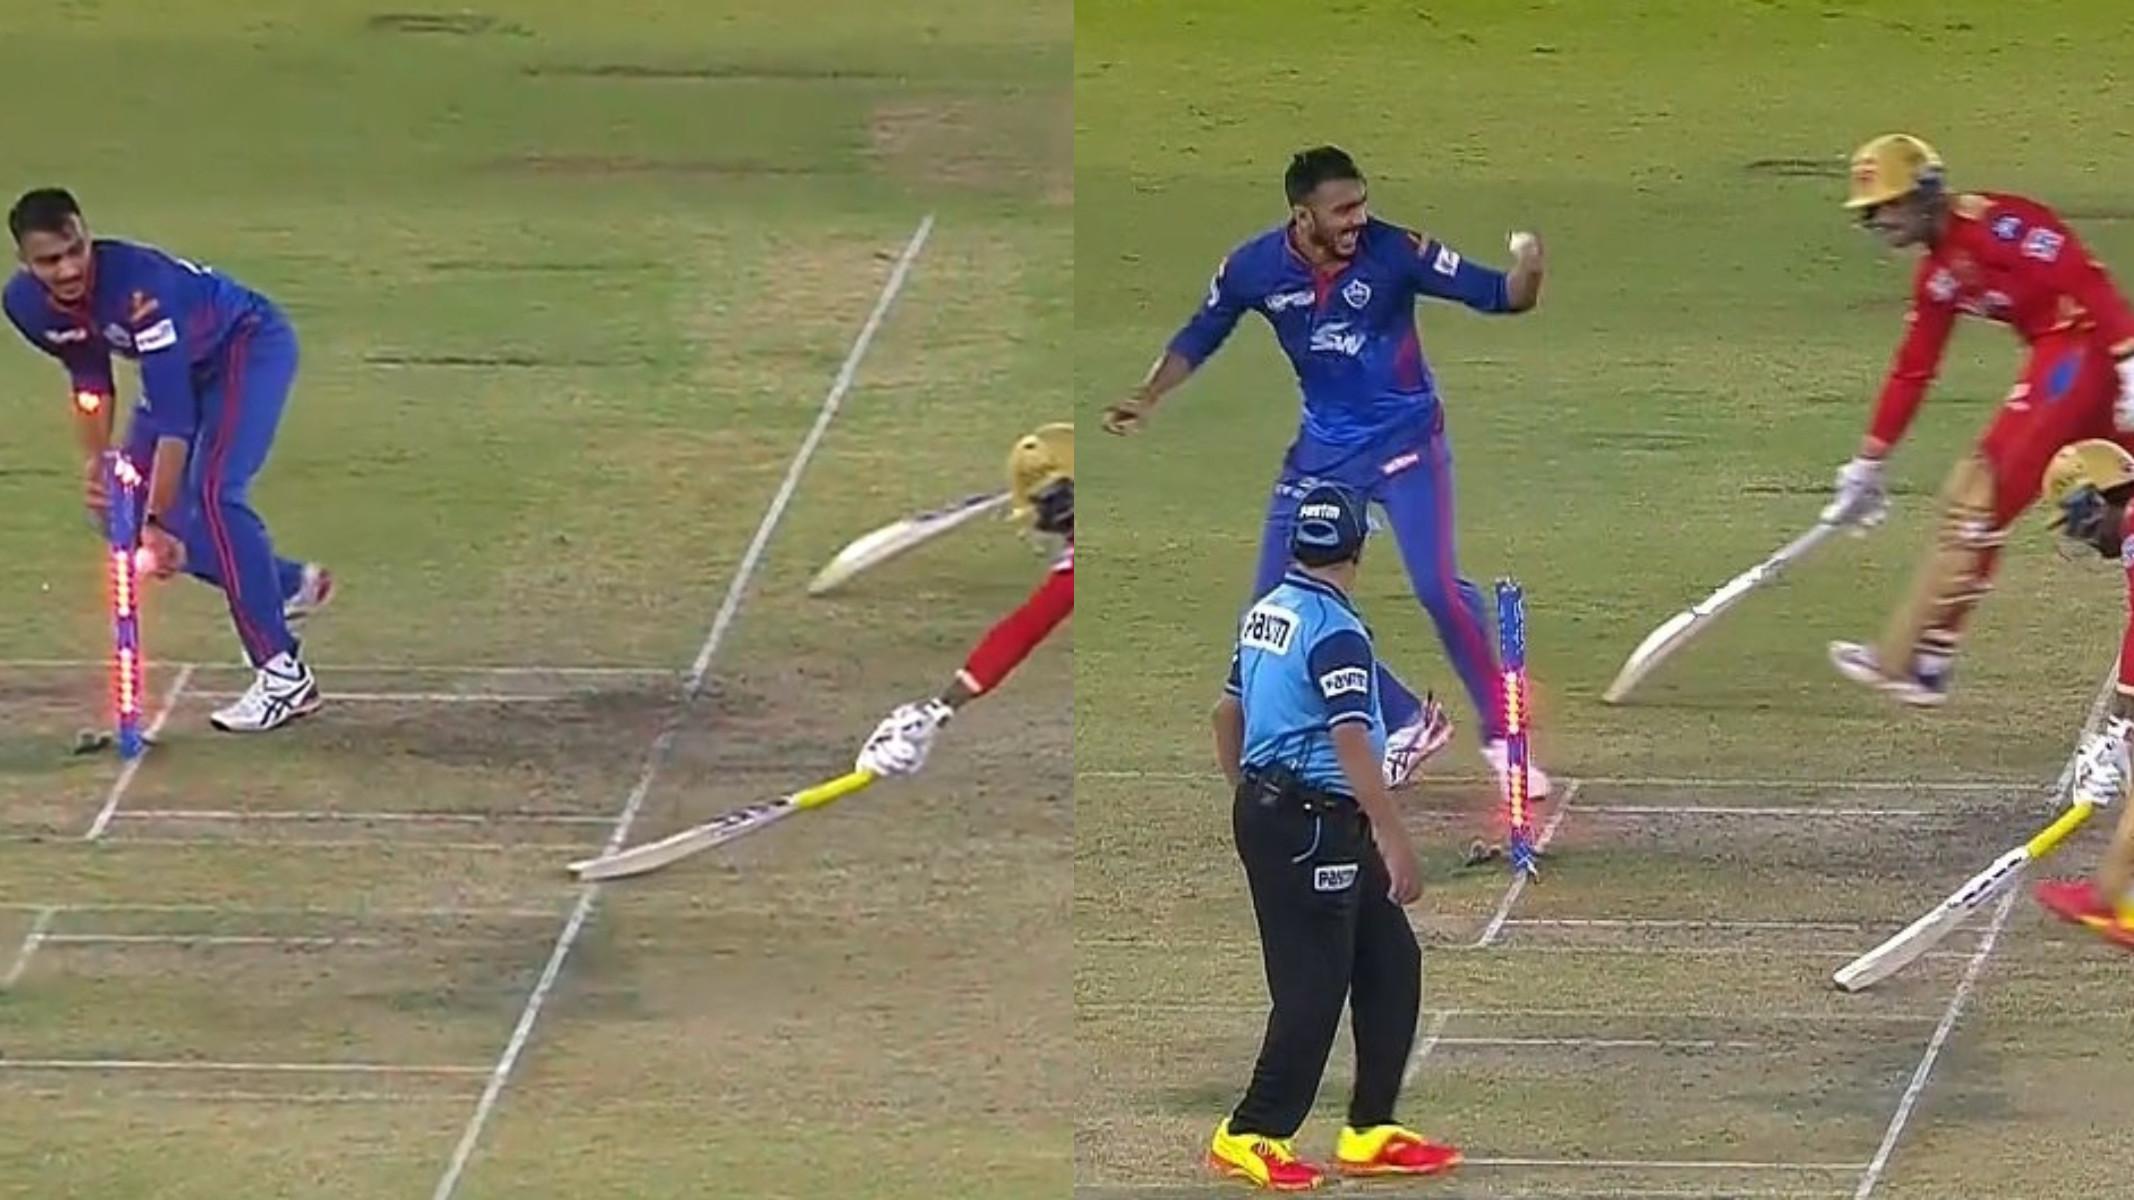 IPL 2021: WATCH- Deepak Hooda gets run-out in hilarious fashion as both batsmen end up at the same end